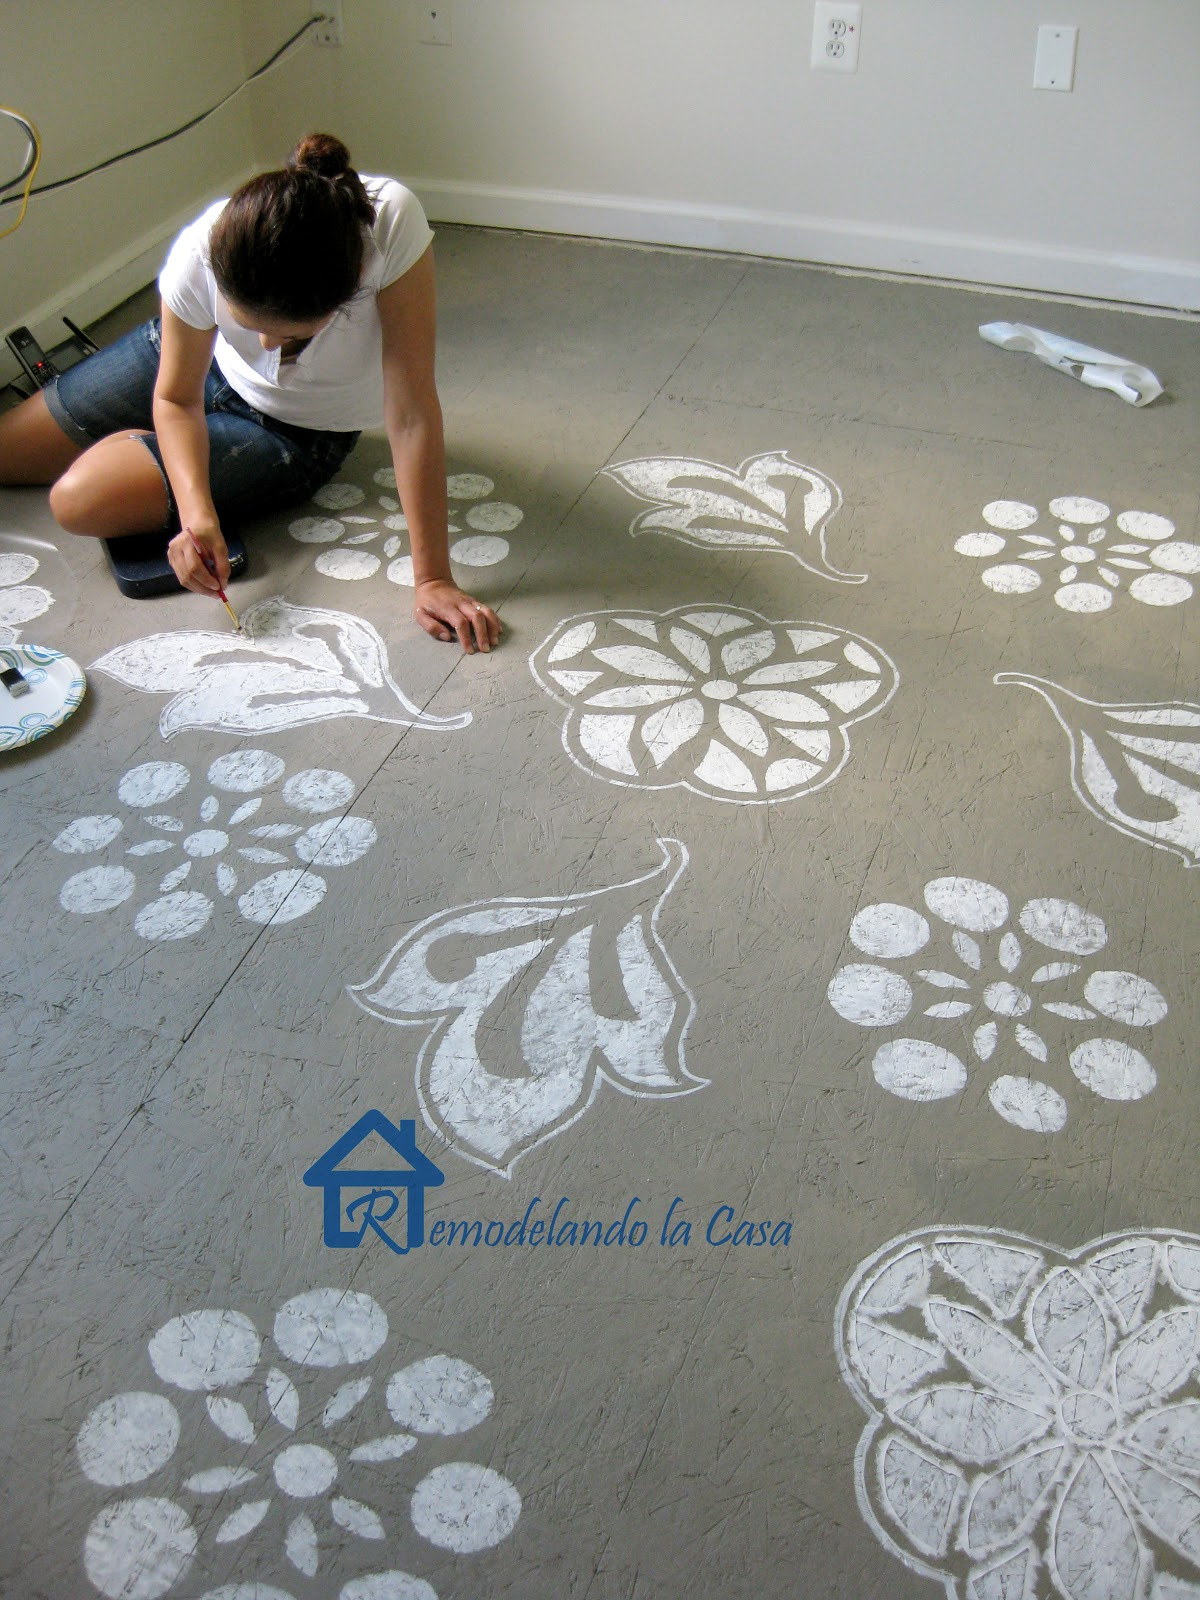 Best ideas about Painted Floors DIY . Save or Pin DIY Painted Swiss Cross Rug Remodelando la Casa Now.